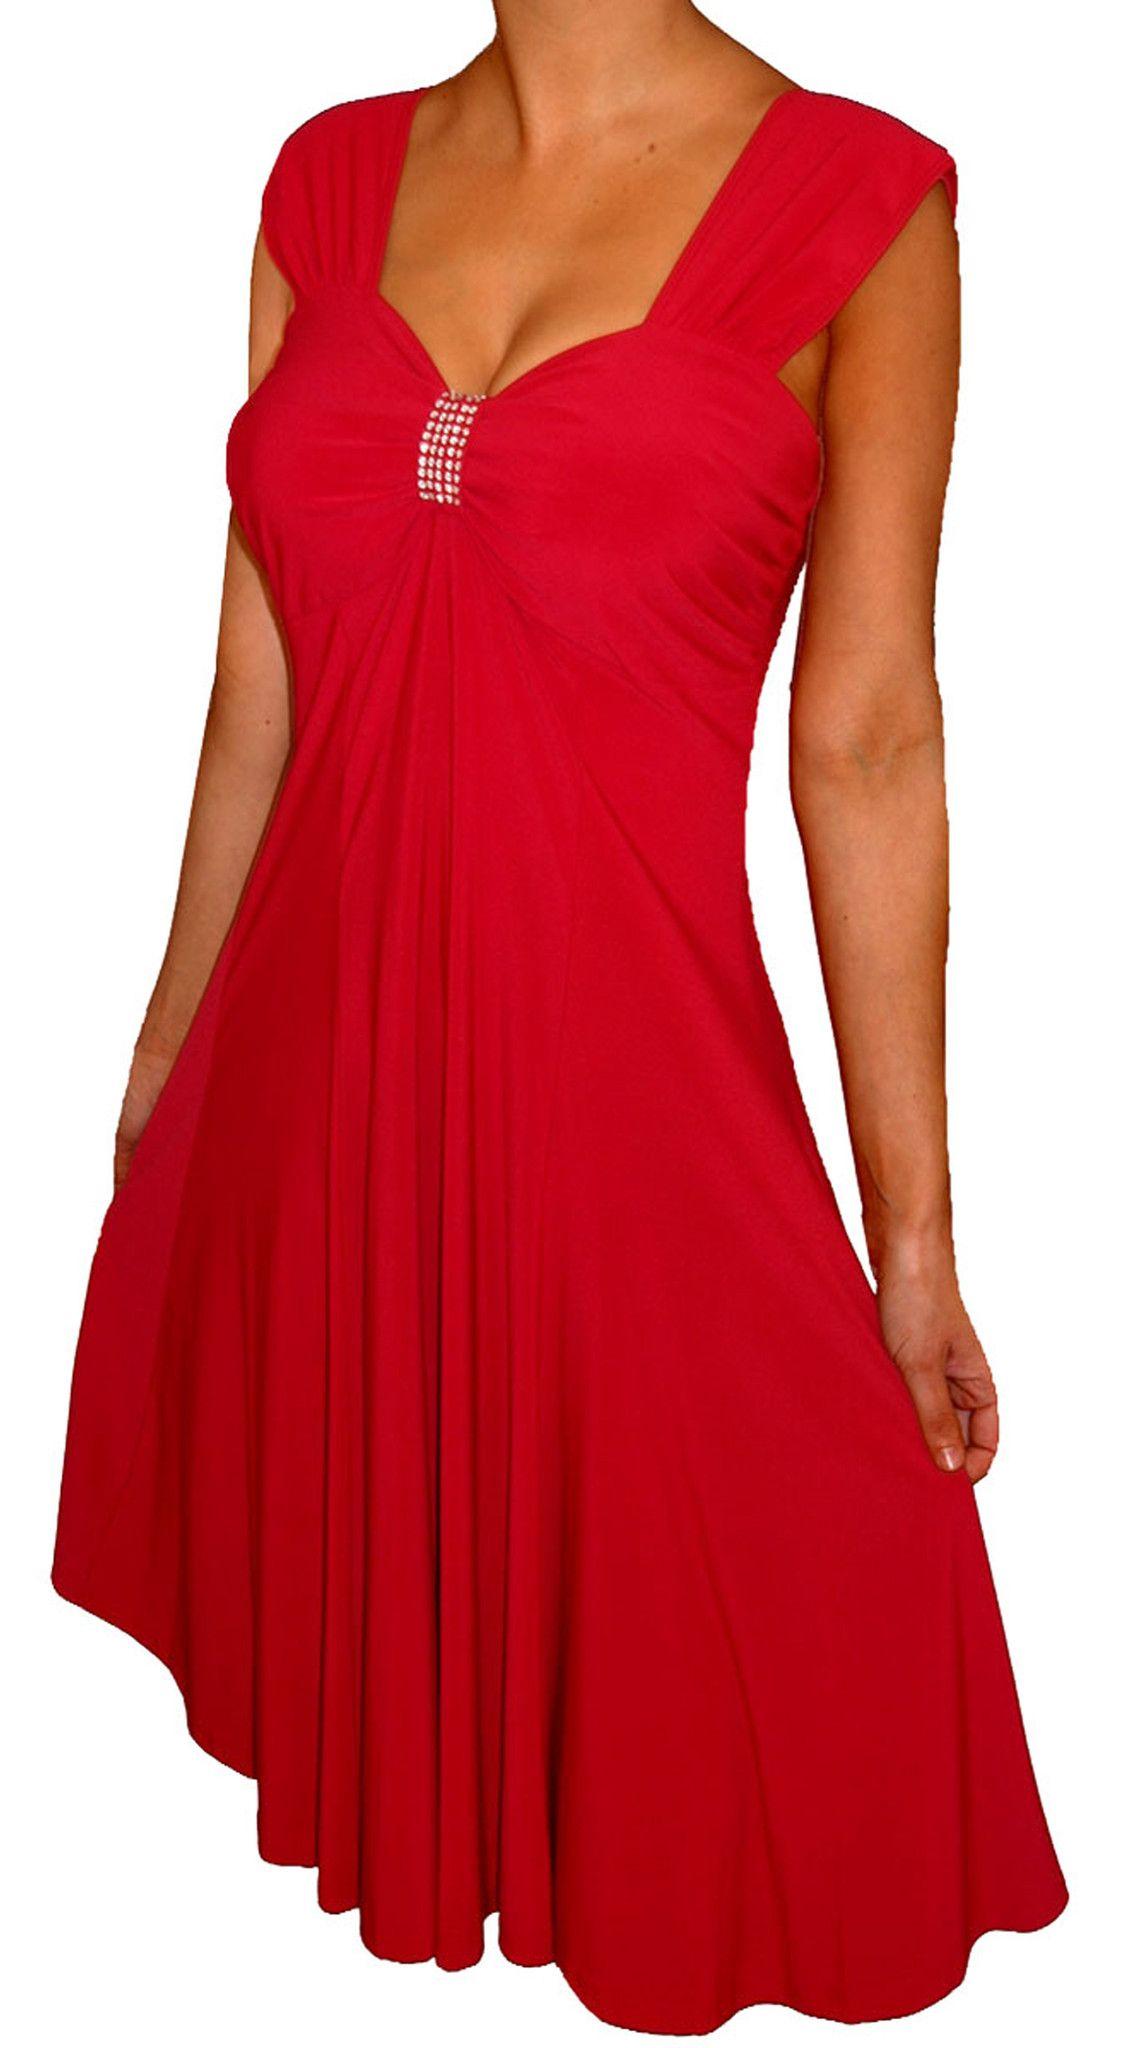 71c534b958 Funfash Plus Size Red Dress Slimming Empire Waist Cocktail Dress New W –  FunFash